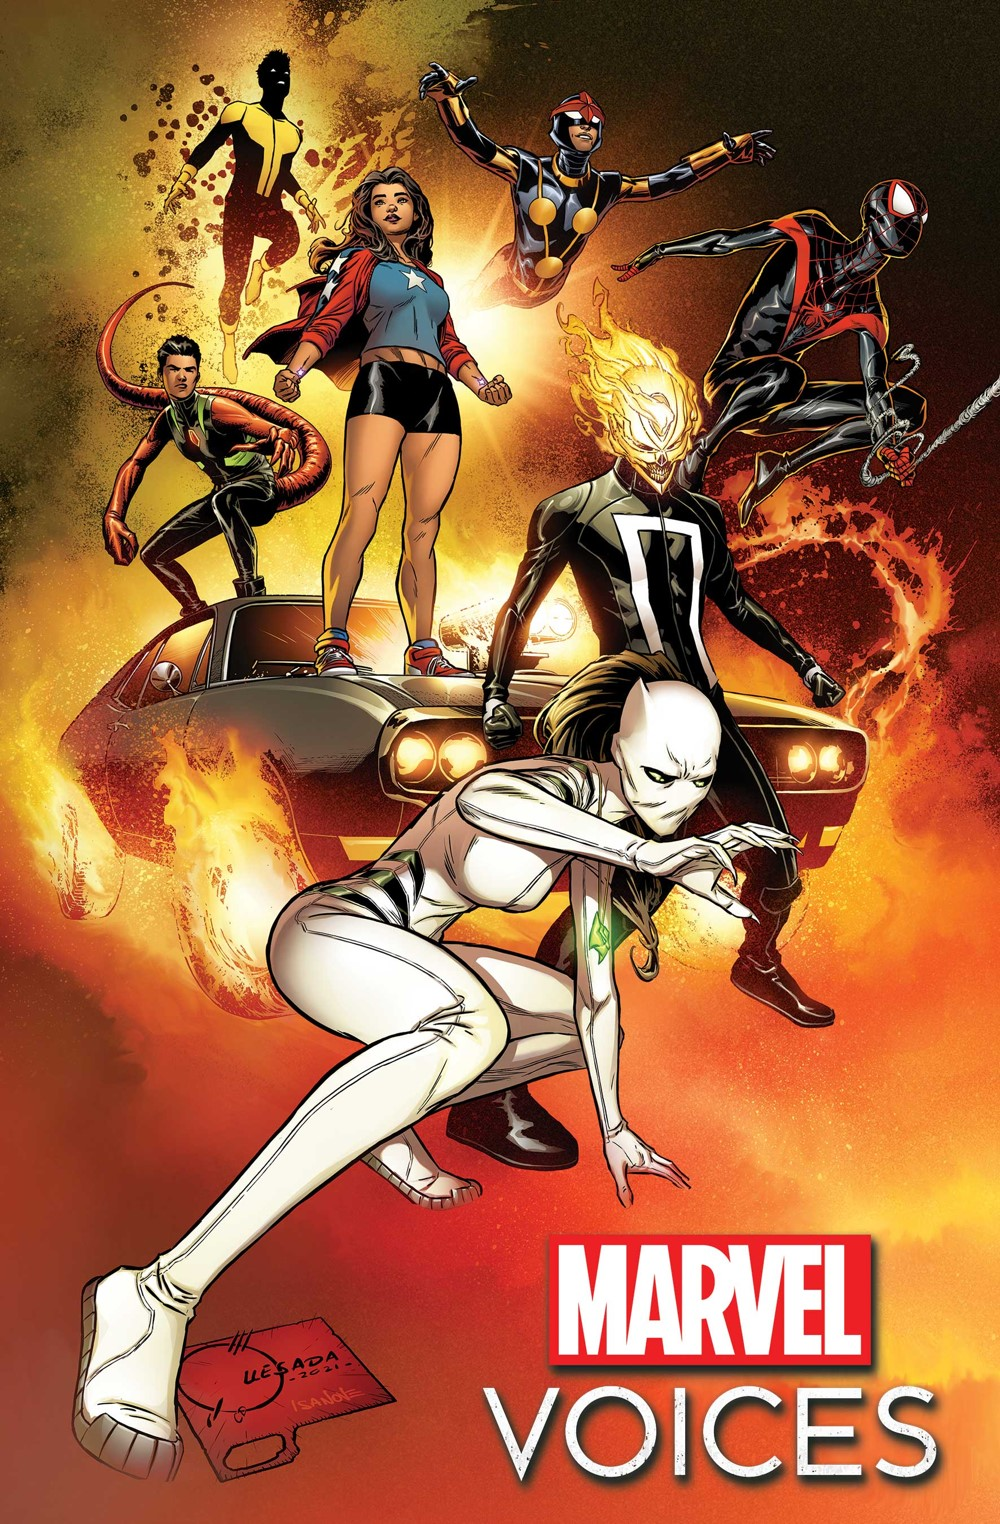 MARVOICESCOM2021001_cvr-1 Marvel Comics October 2021 Solicitations